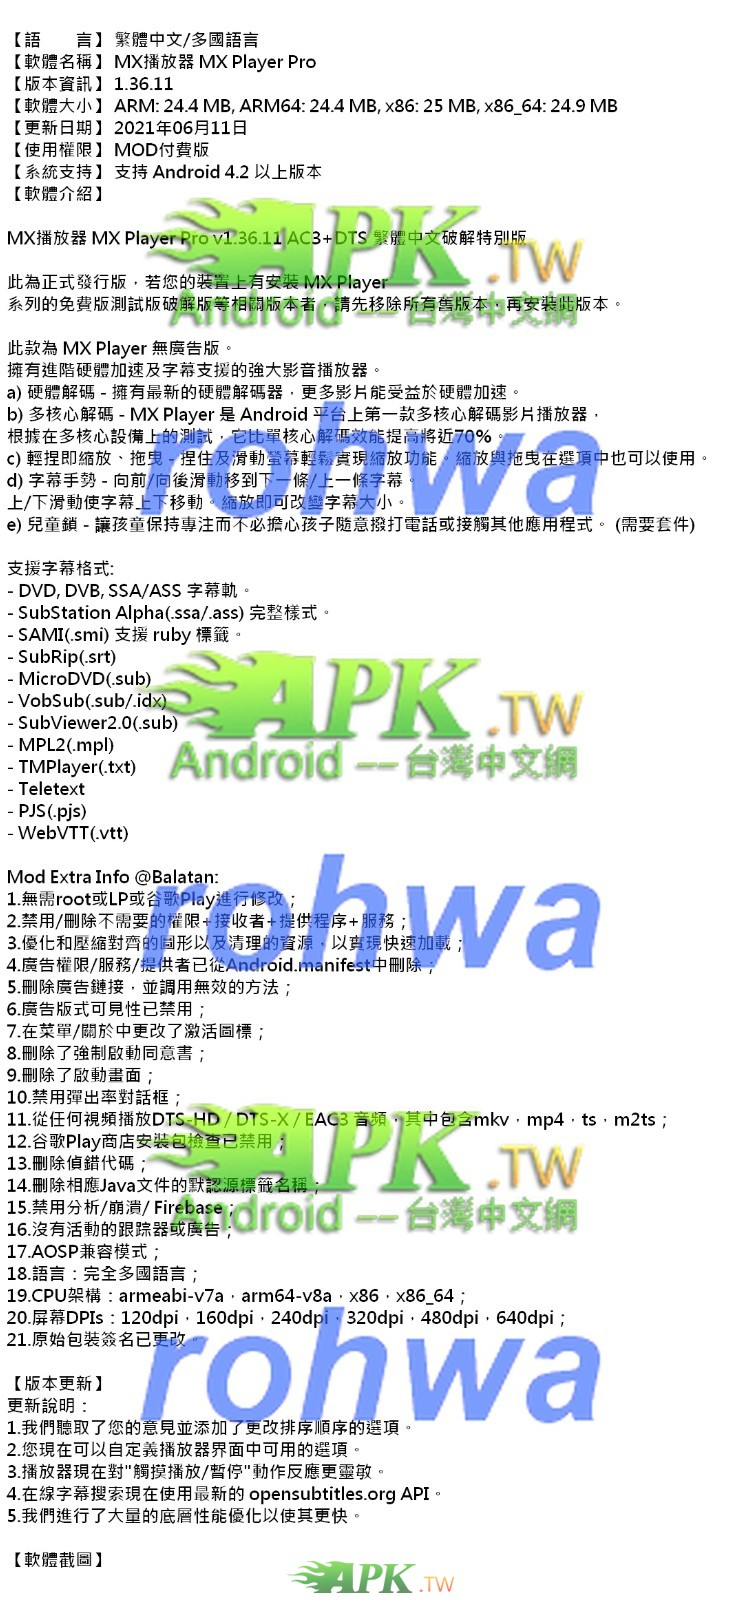 MX_Player_Pro_1.36.11_.jpg